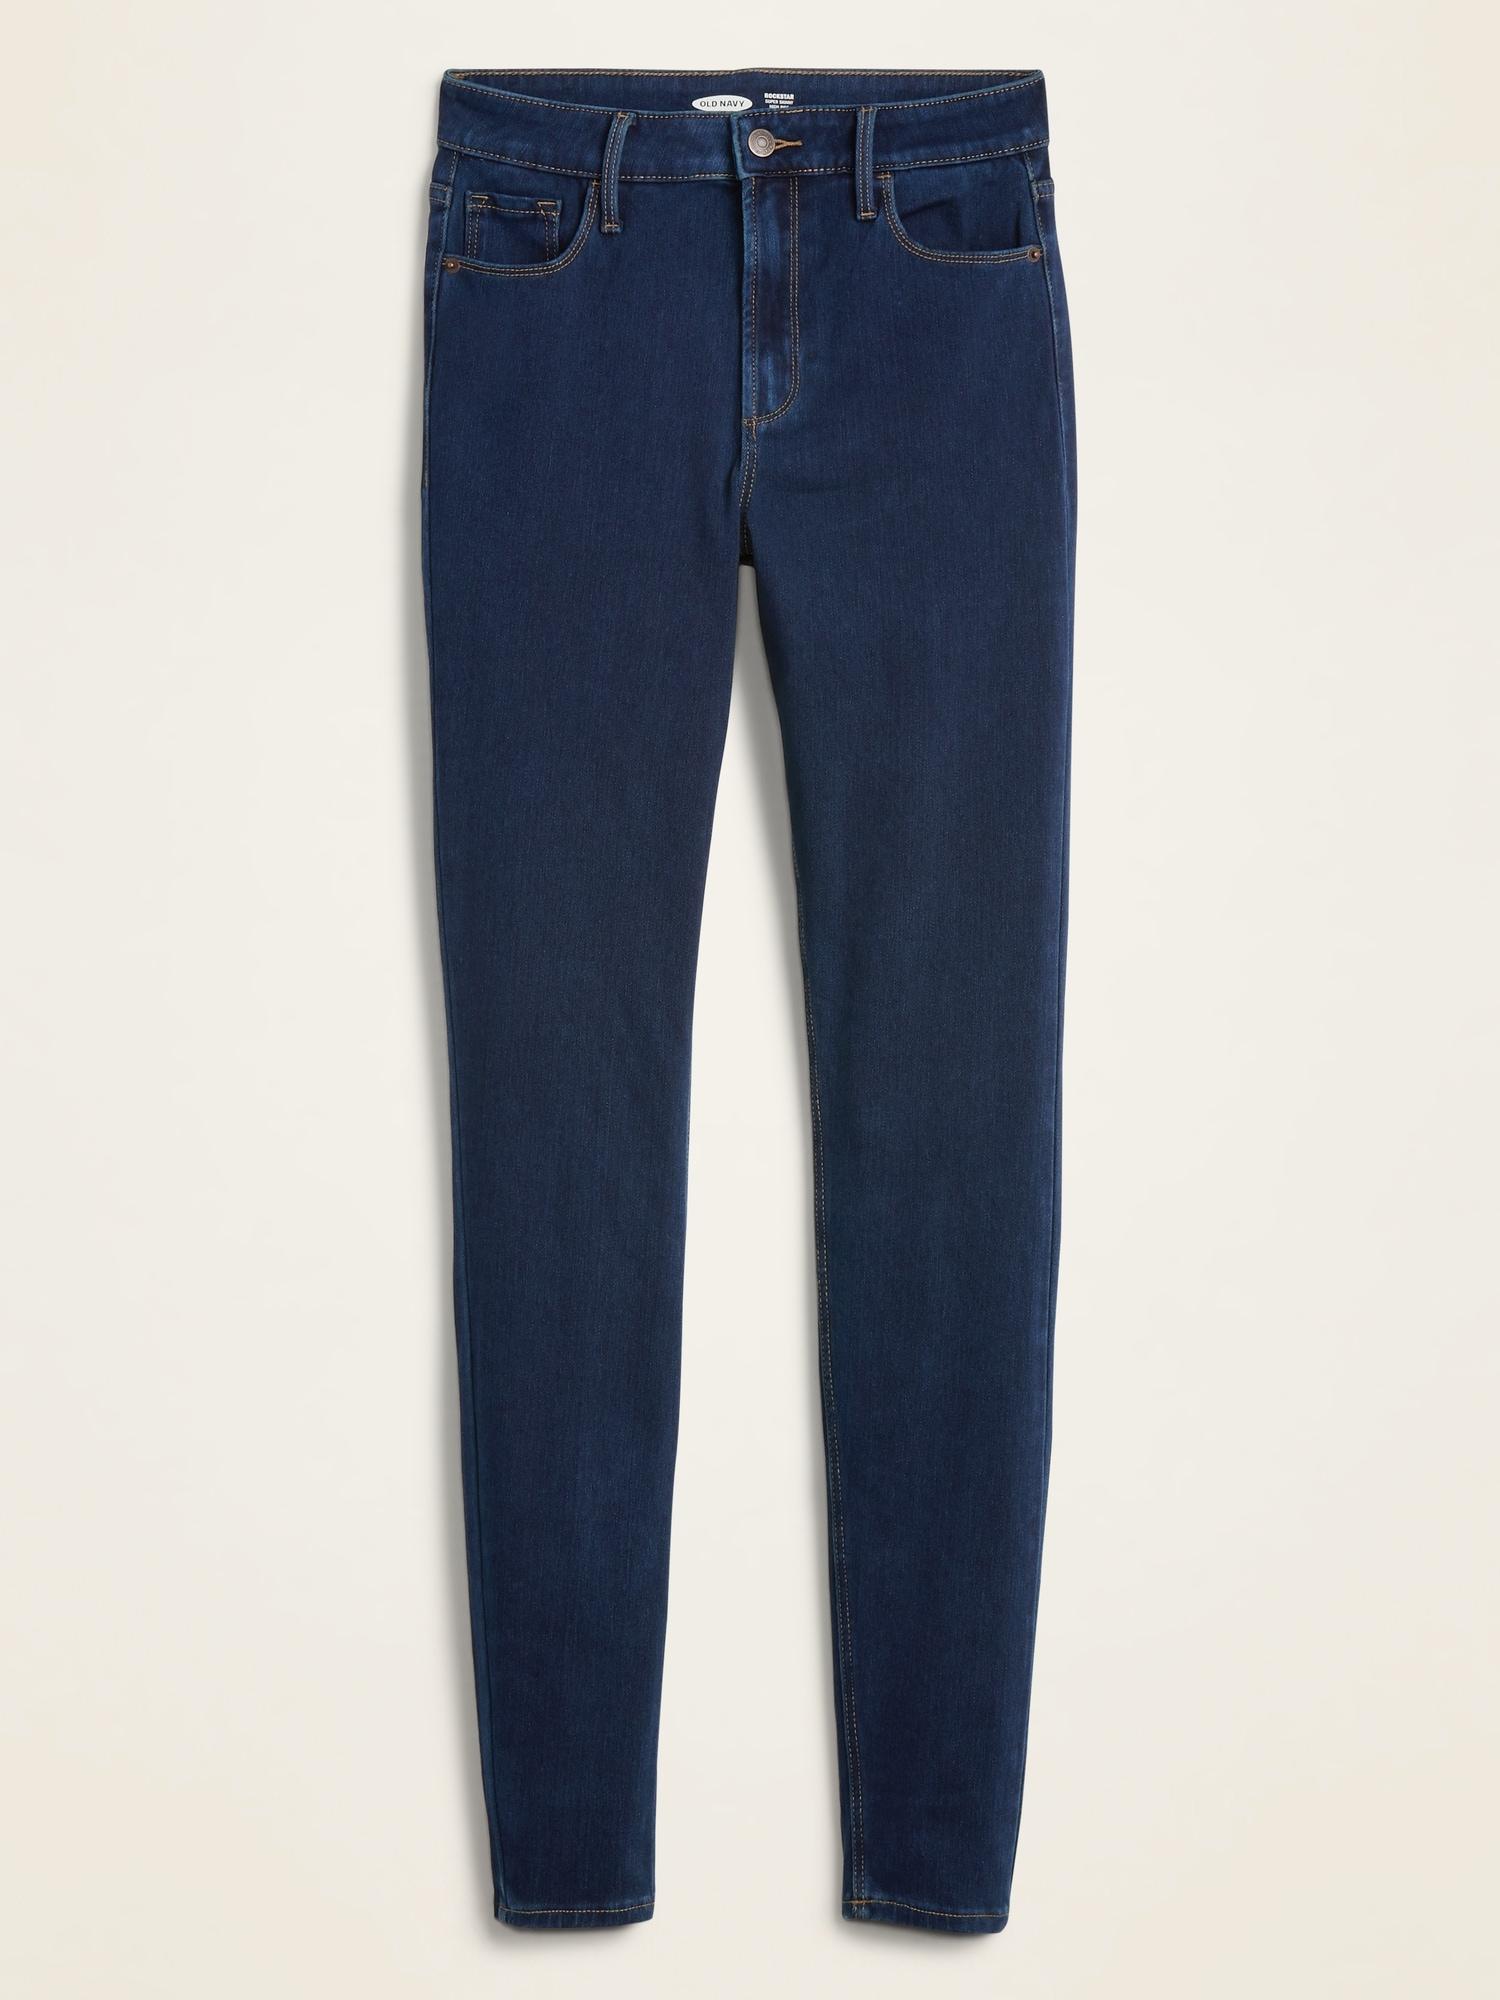 13d2f11c5f0f7 High-Rise Rockstar 24/7 Sculpt Super Skinny Jeans for Women | Old Navy